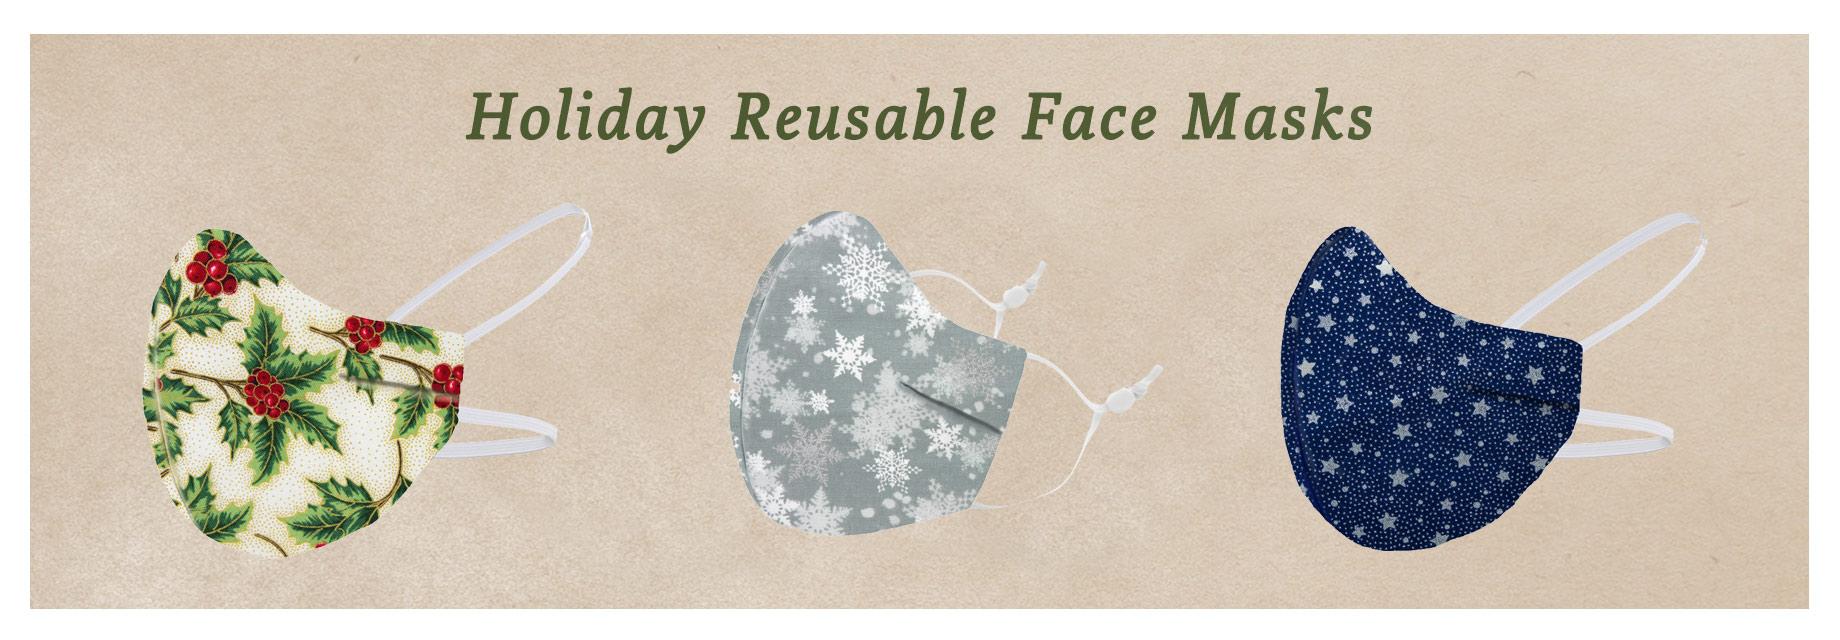 Holiday Reusable Face Masks